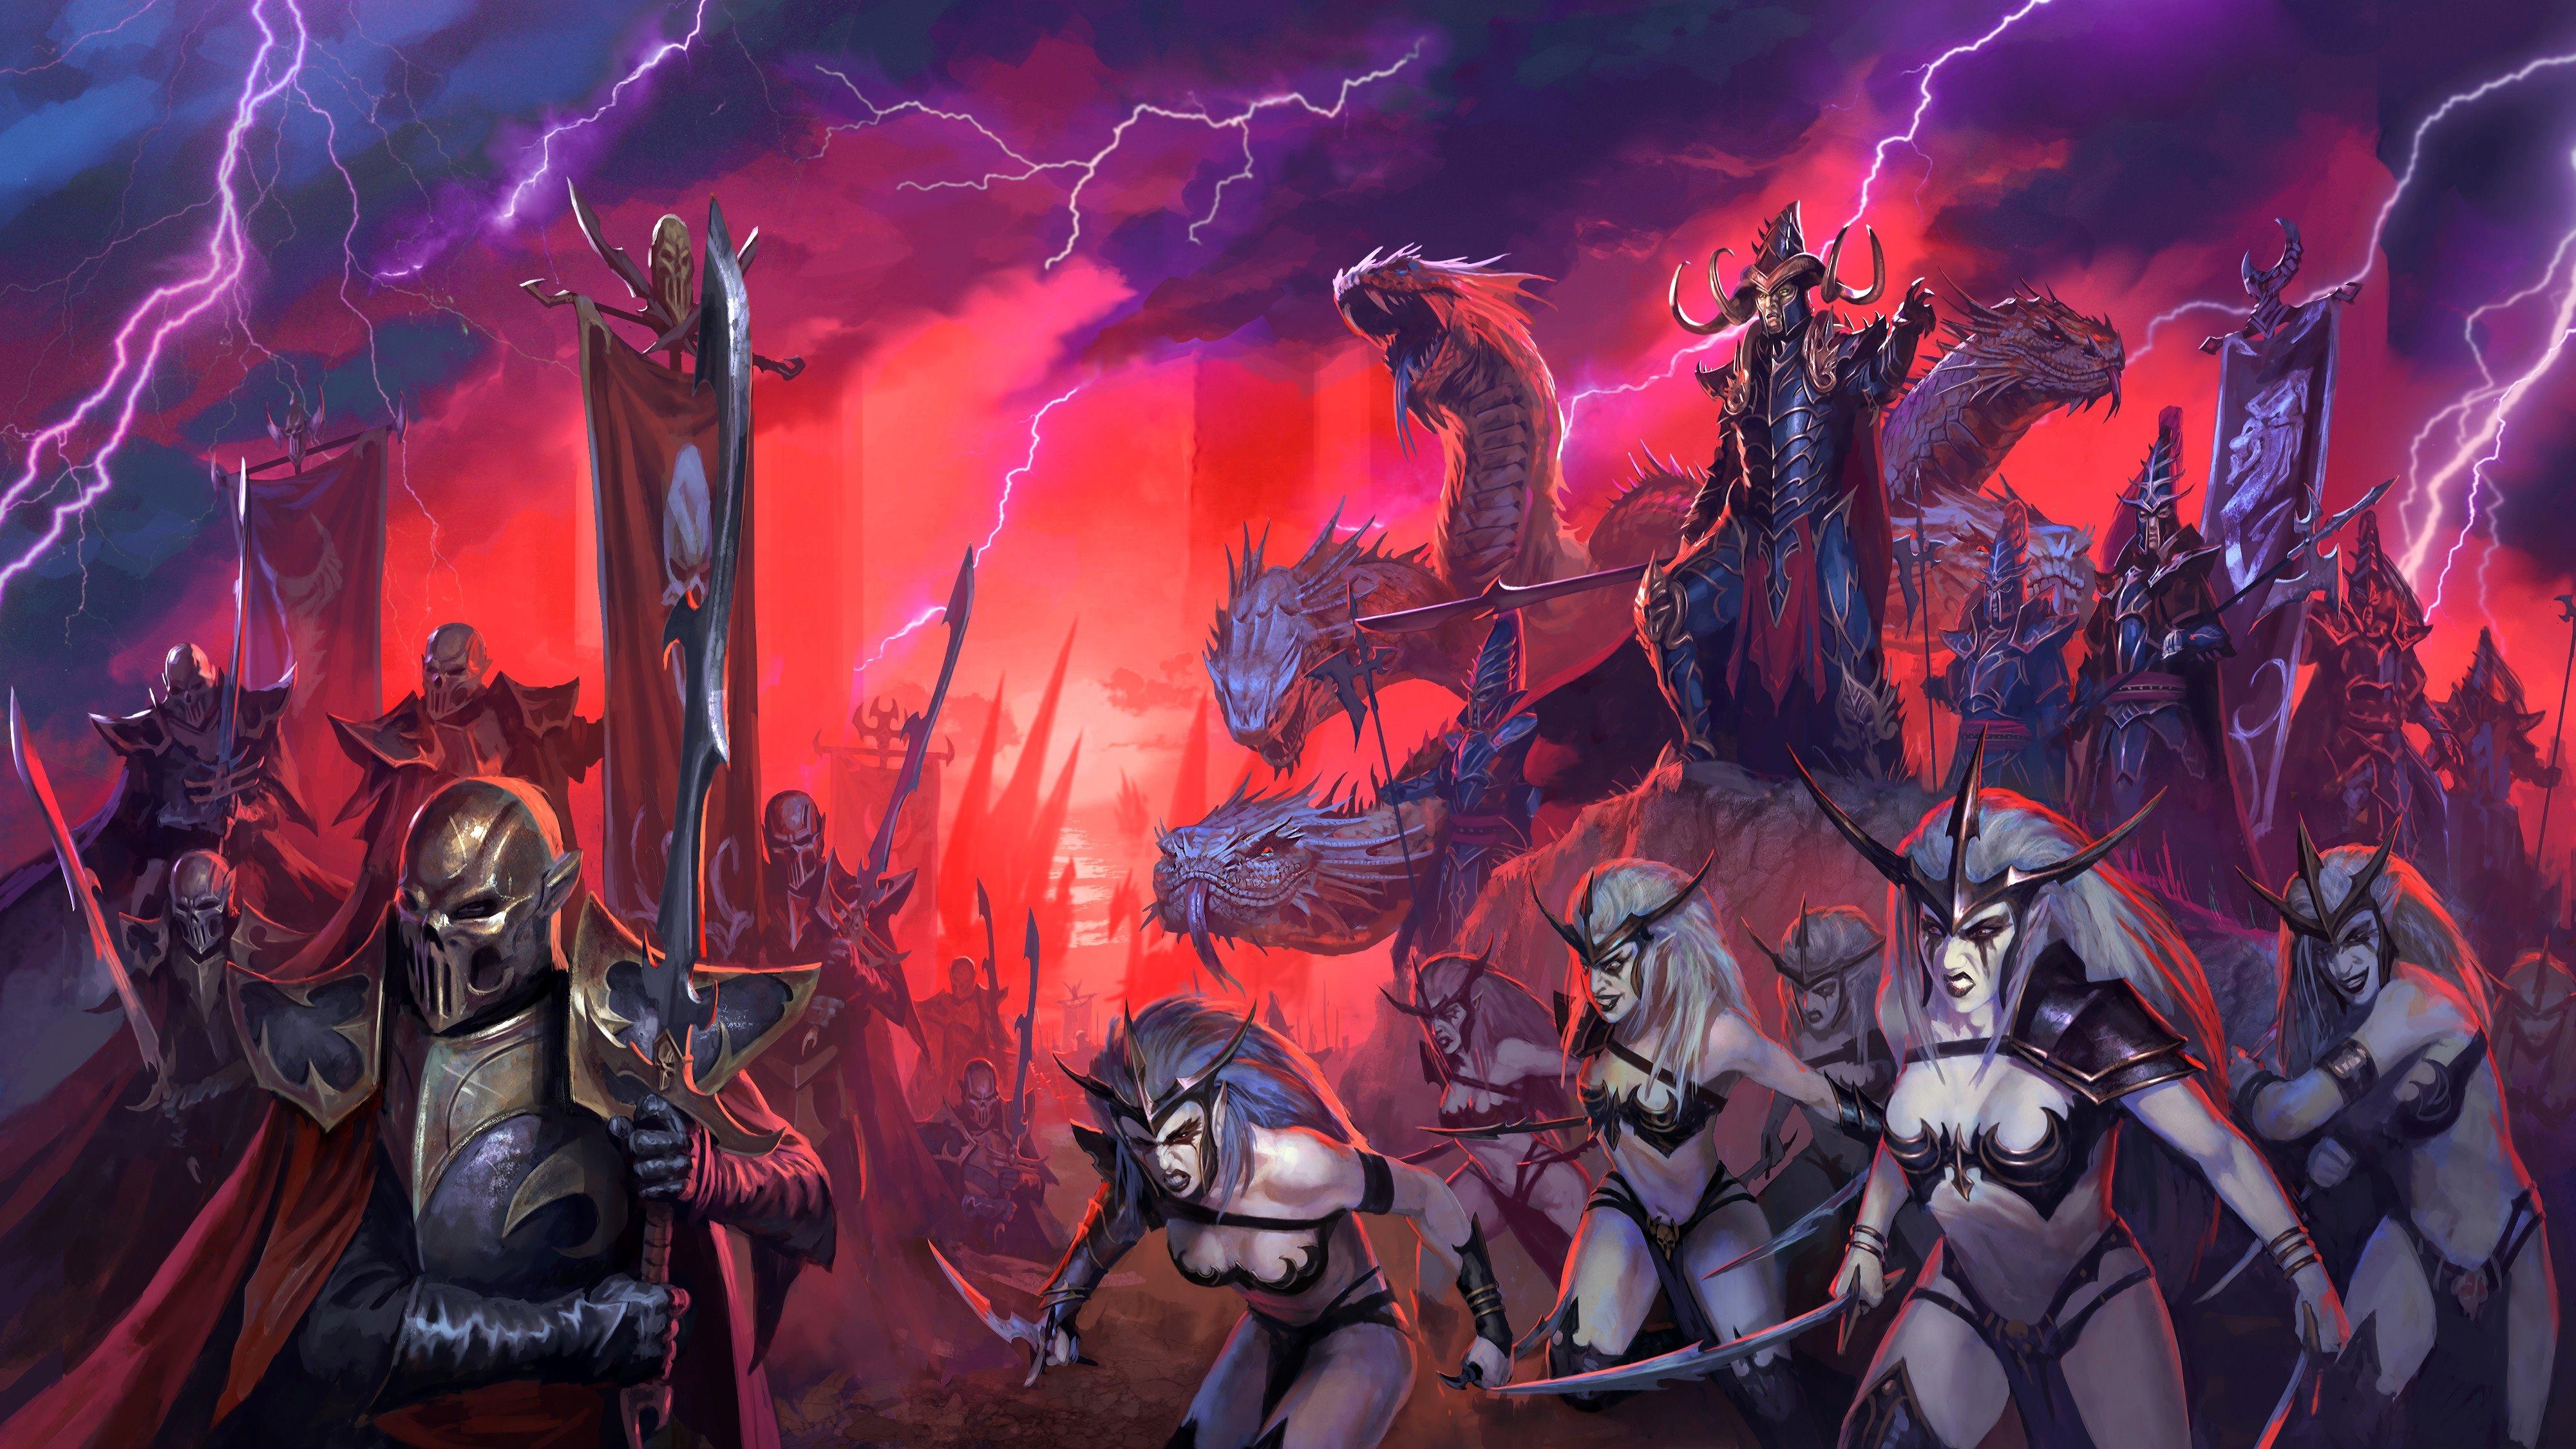 Warhammer-Hauts Elfes-Guerrier fantôme//Soeur avelorn-Torse guerrier 1